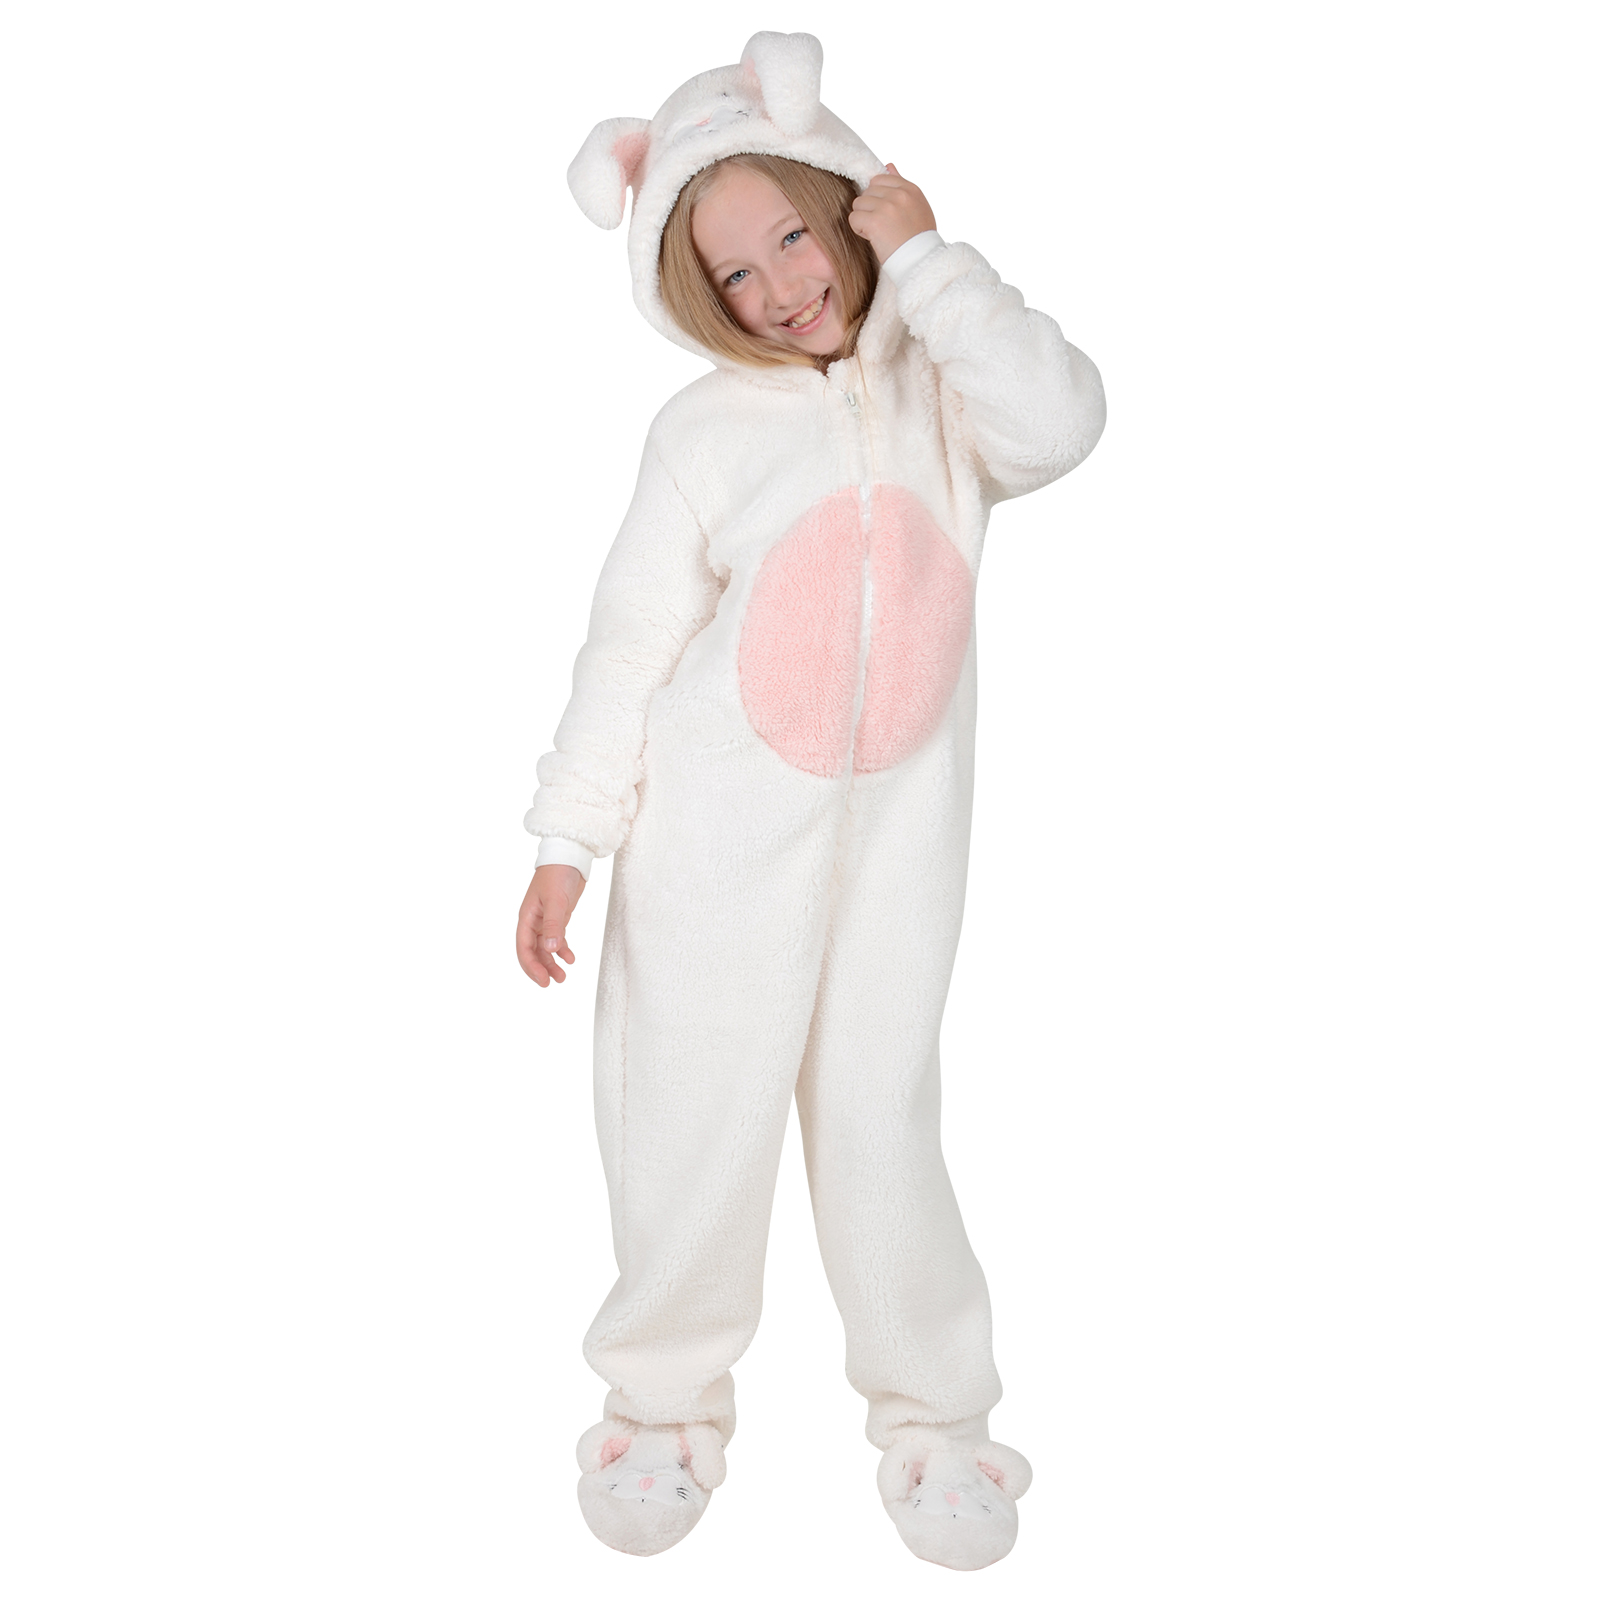 girls hooded fleece all in one piece pyjamas jump sleep suit pj nightwear new ebay. Black Bedroom Furniture Sets. Home Design Ideas